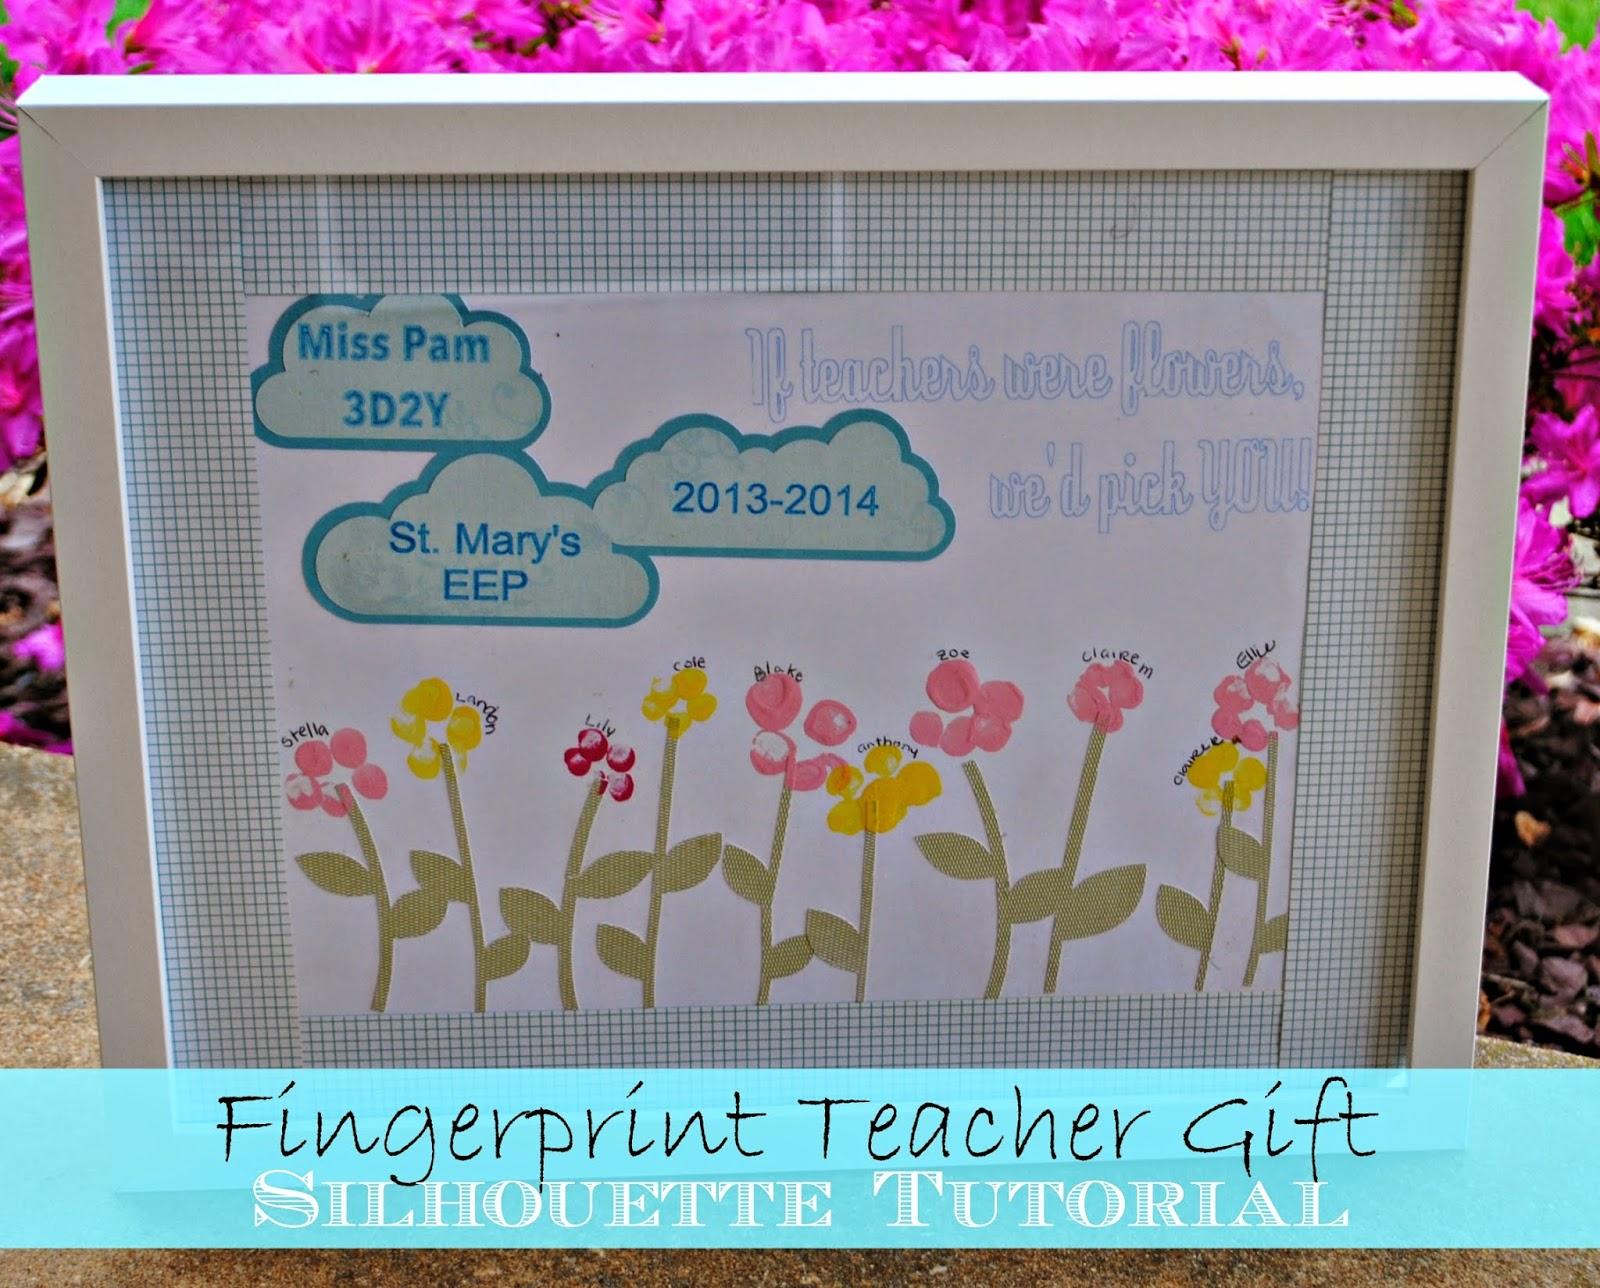 Diy end of the year teacher gift fingerprint art meets silhouette diy end of the year teacher gift fingerprint art meets silhouette solutioingenieria Choice Image